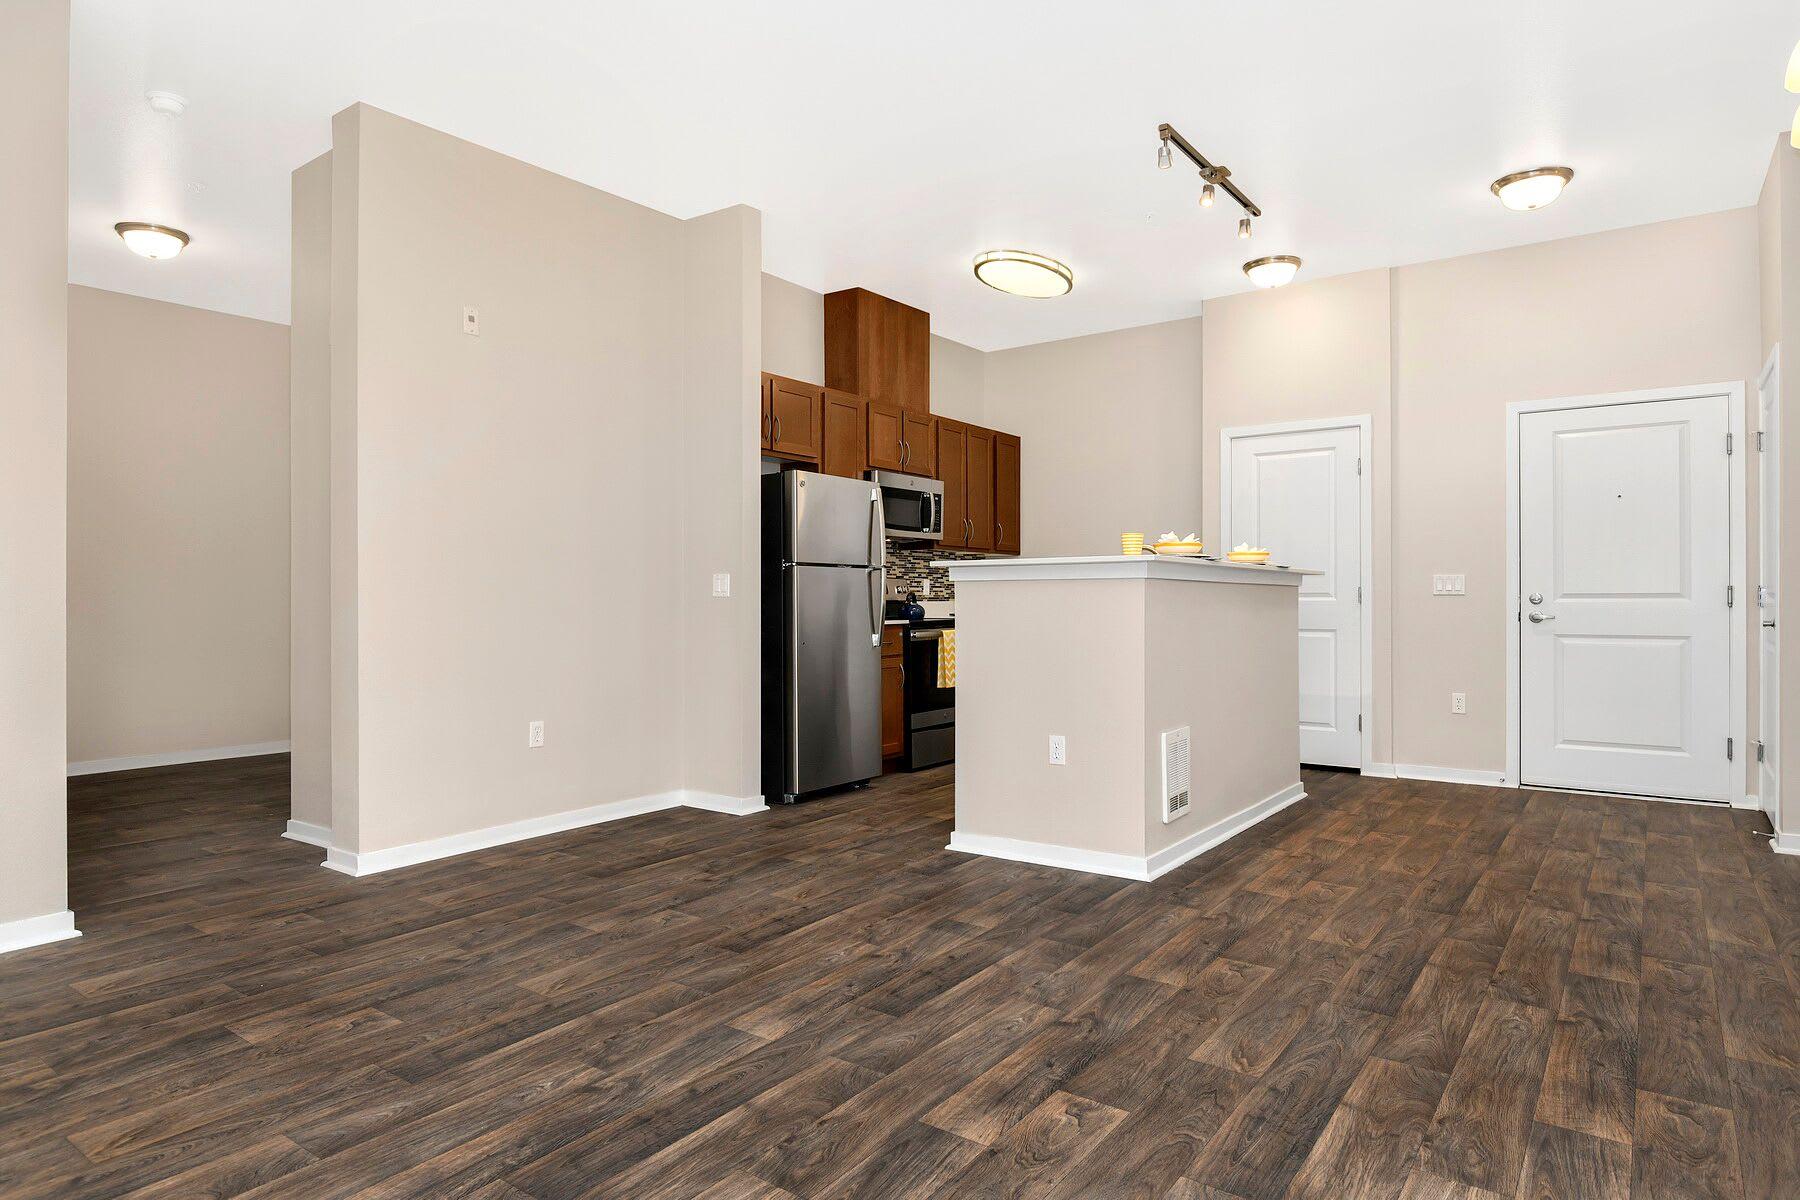 Hardwood Floors at Reunion at Redmond Ridge, Redmond, Washington